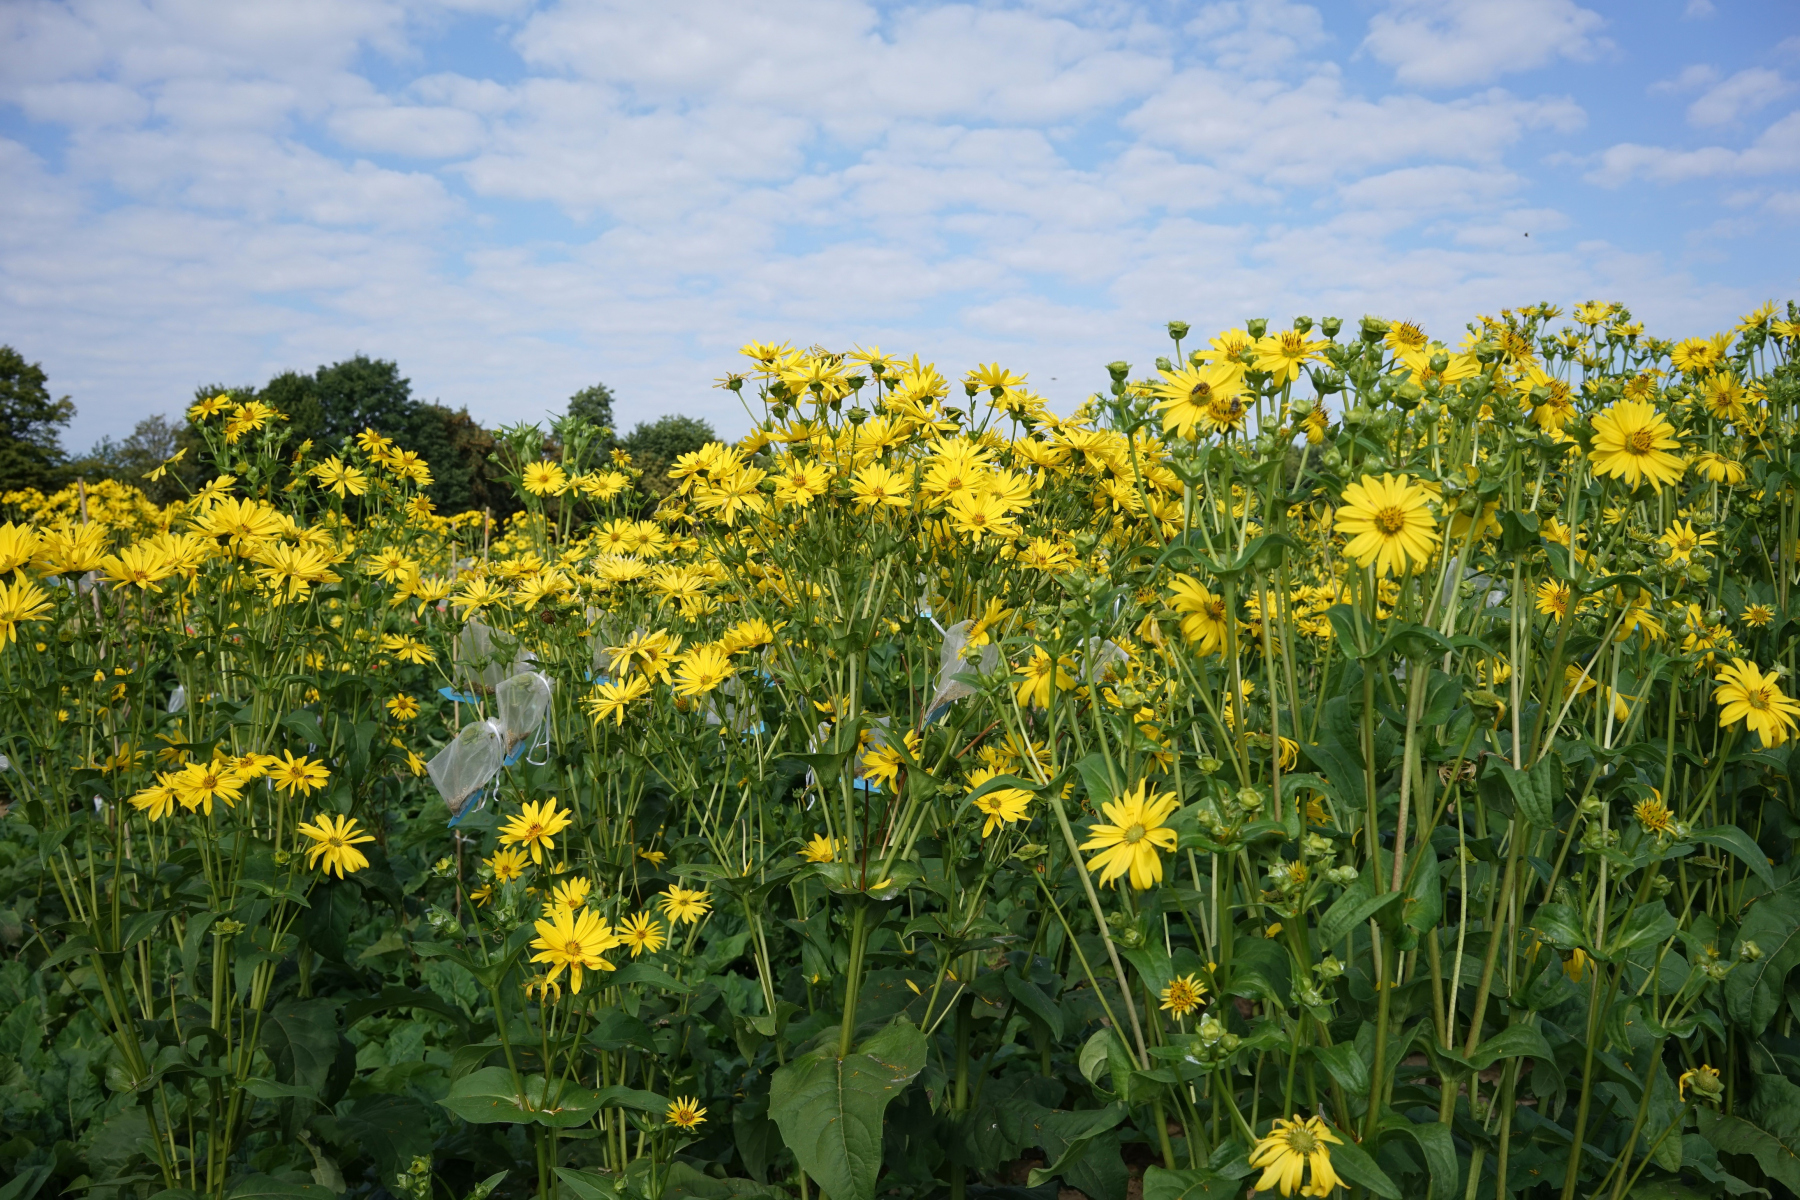 Die Becherpflanze Silphium perfoliatum  Quelle: Forschungszentrum Jülich